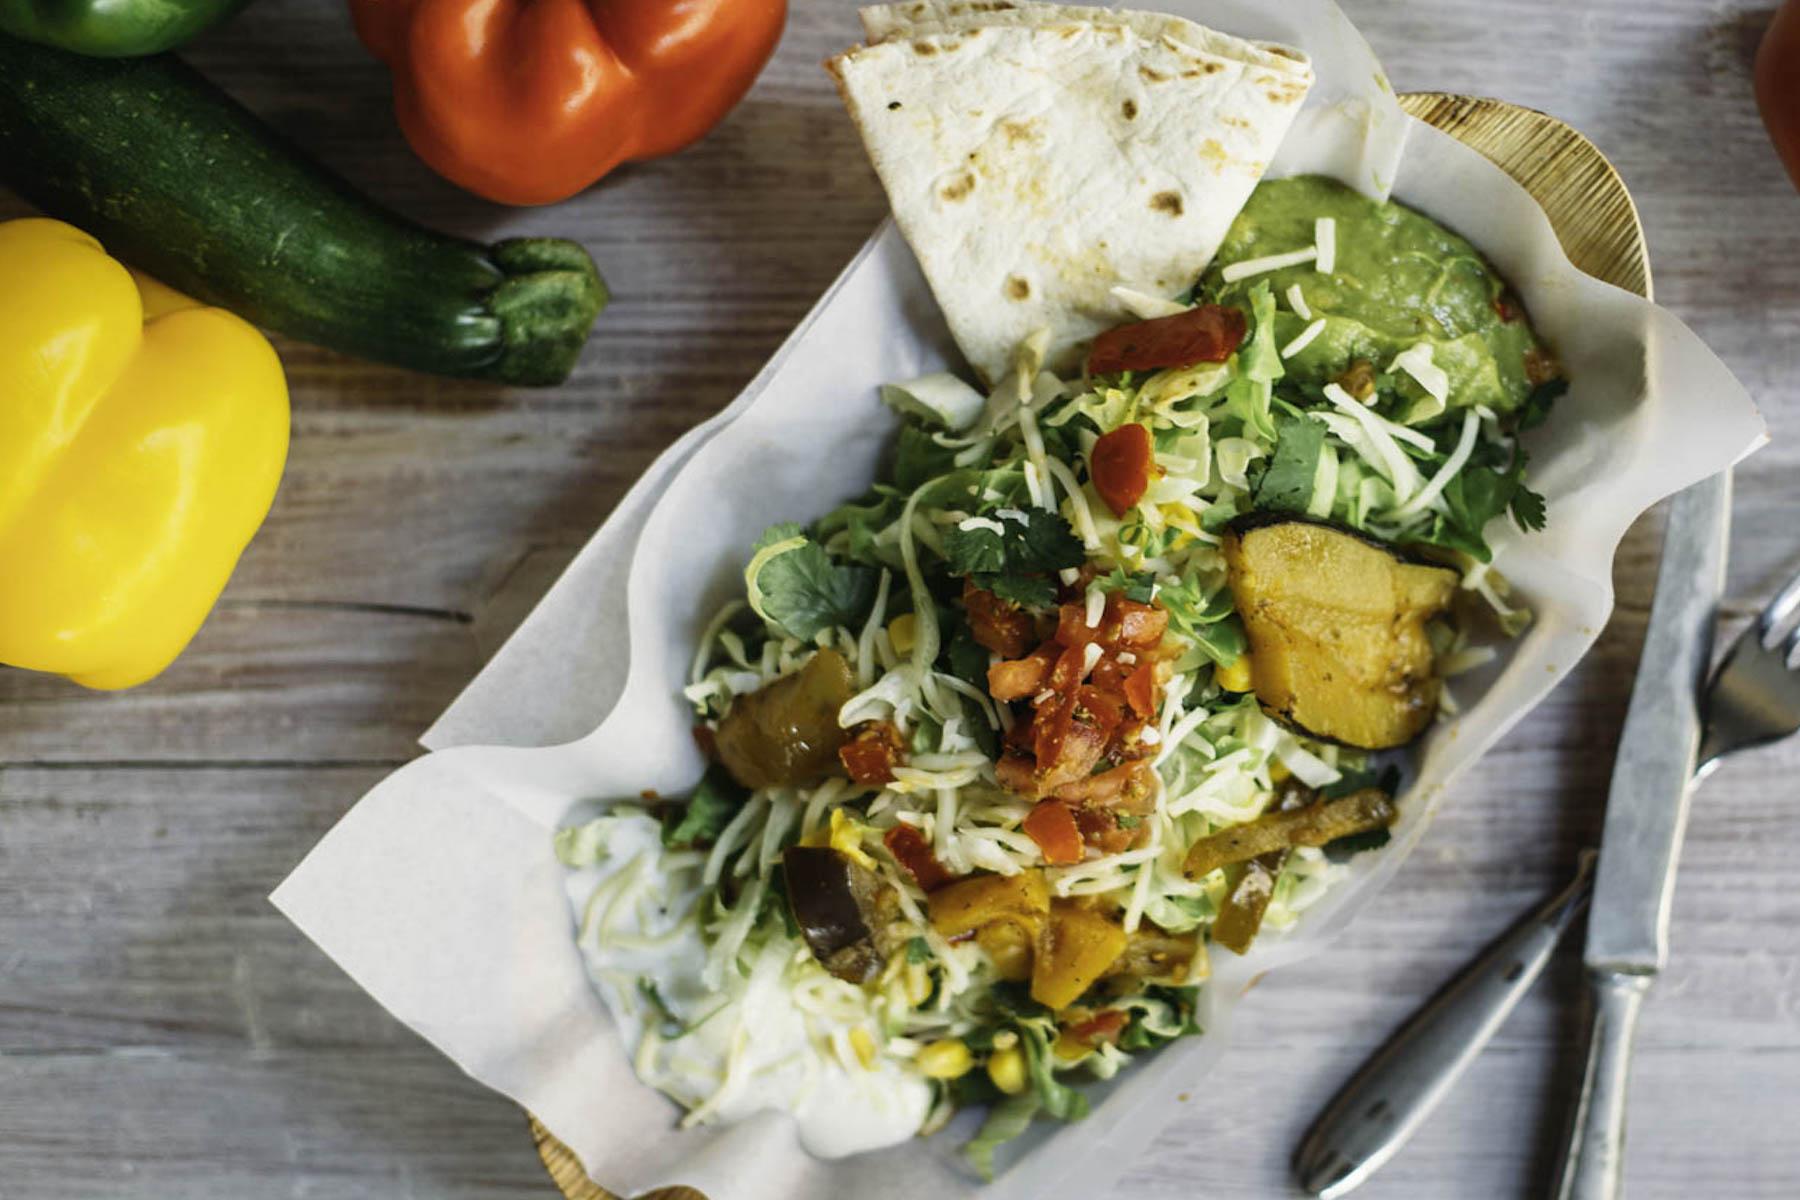 burrito-company-fraeulein-edith-deliveroo_veggie-mexican-salad_.jpg